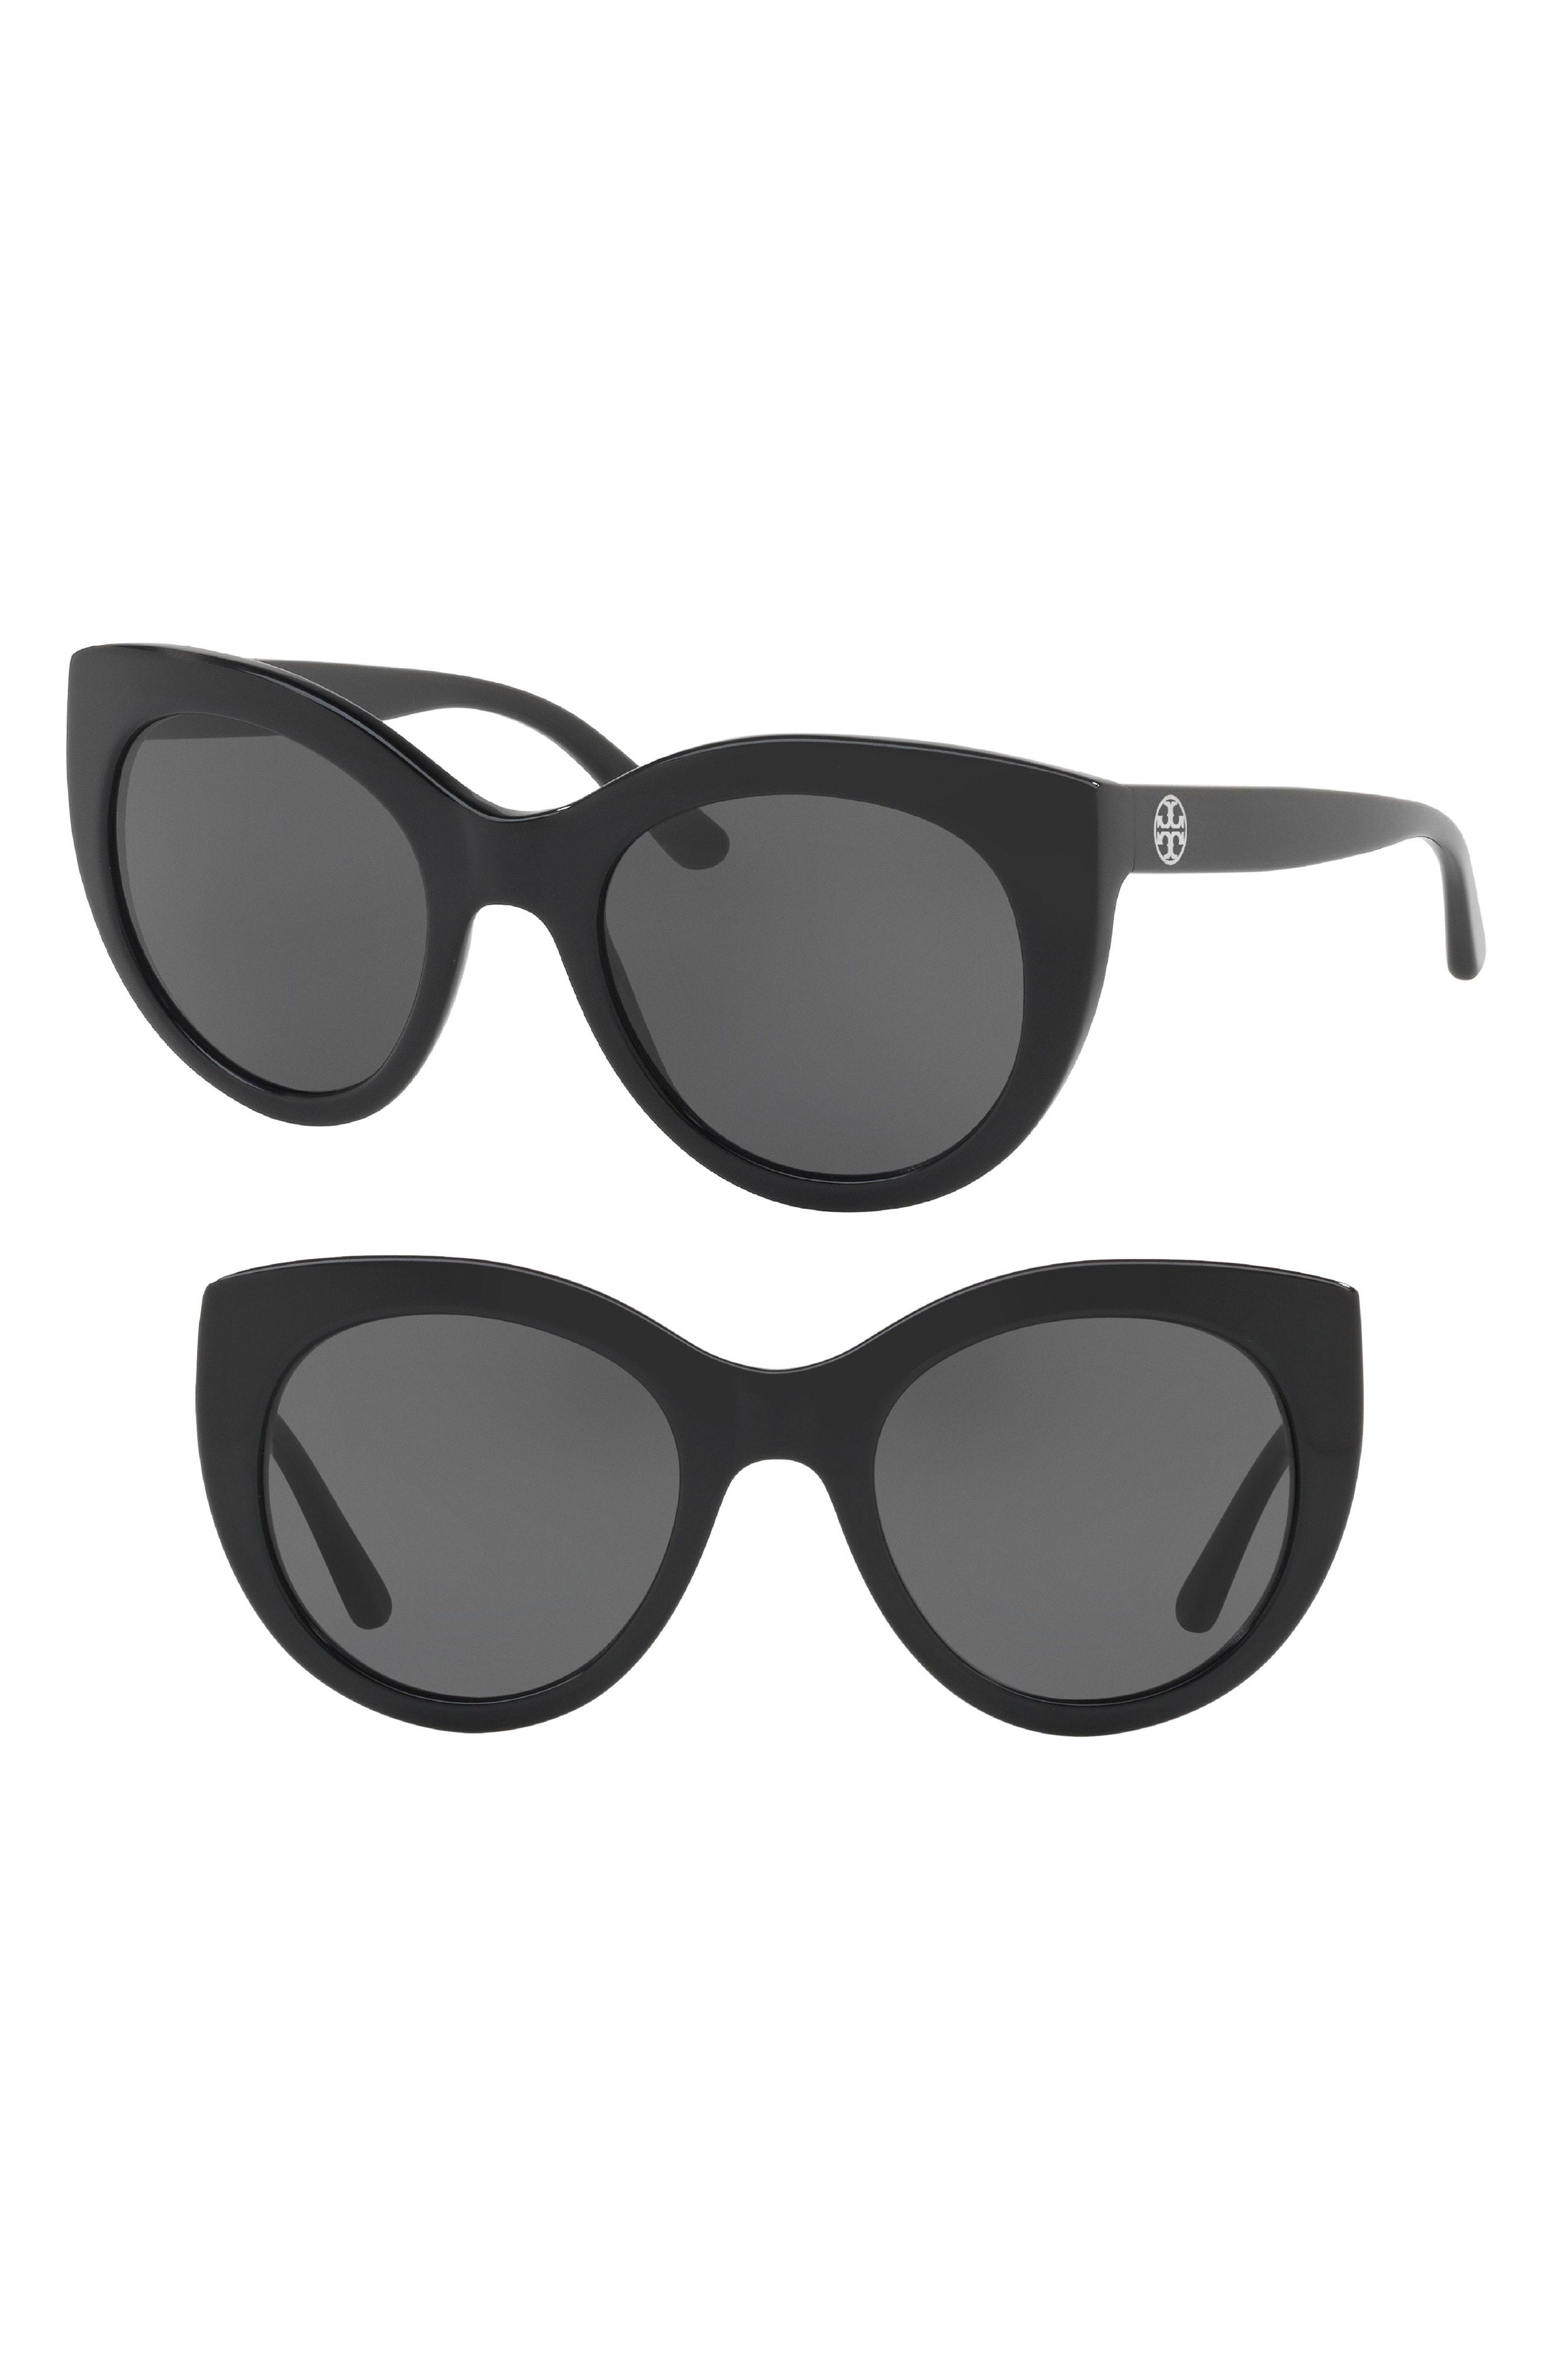 Tory Burch 51mm Cat Eye Sunglasses